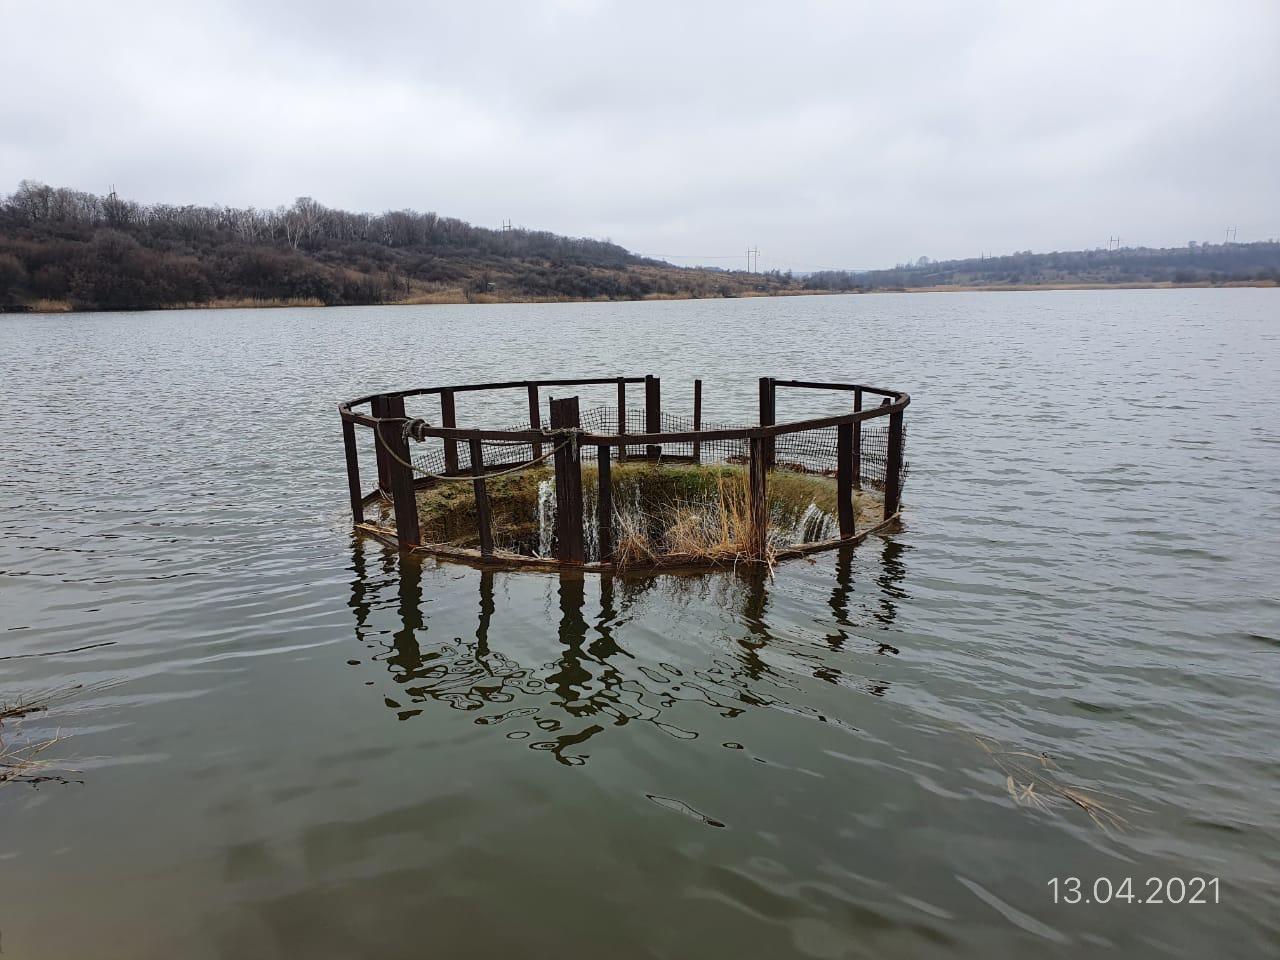 Робоча група обстежила водні об'єкти Покровського району